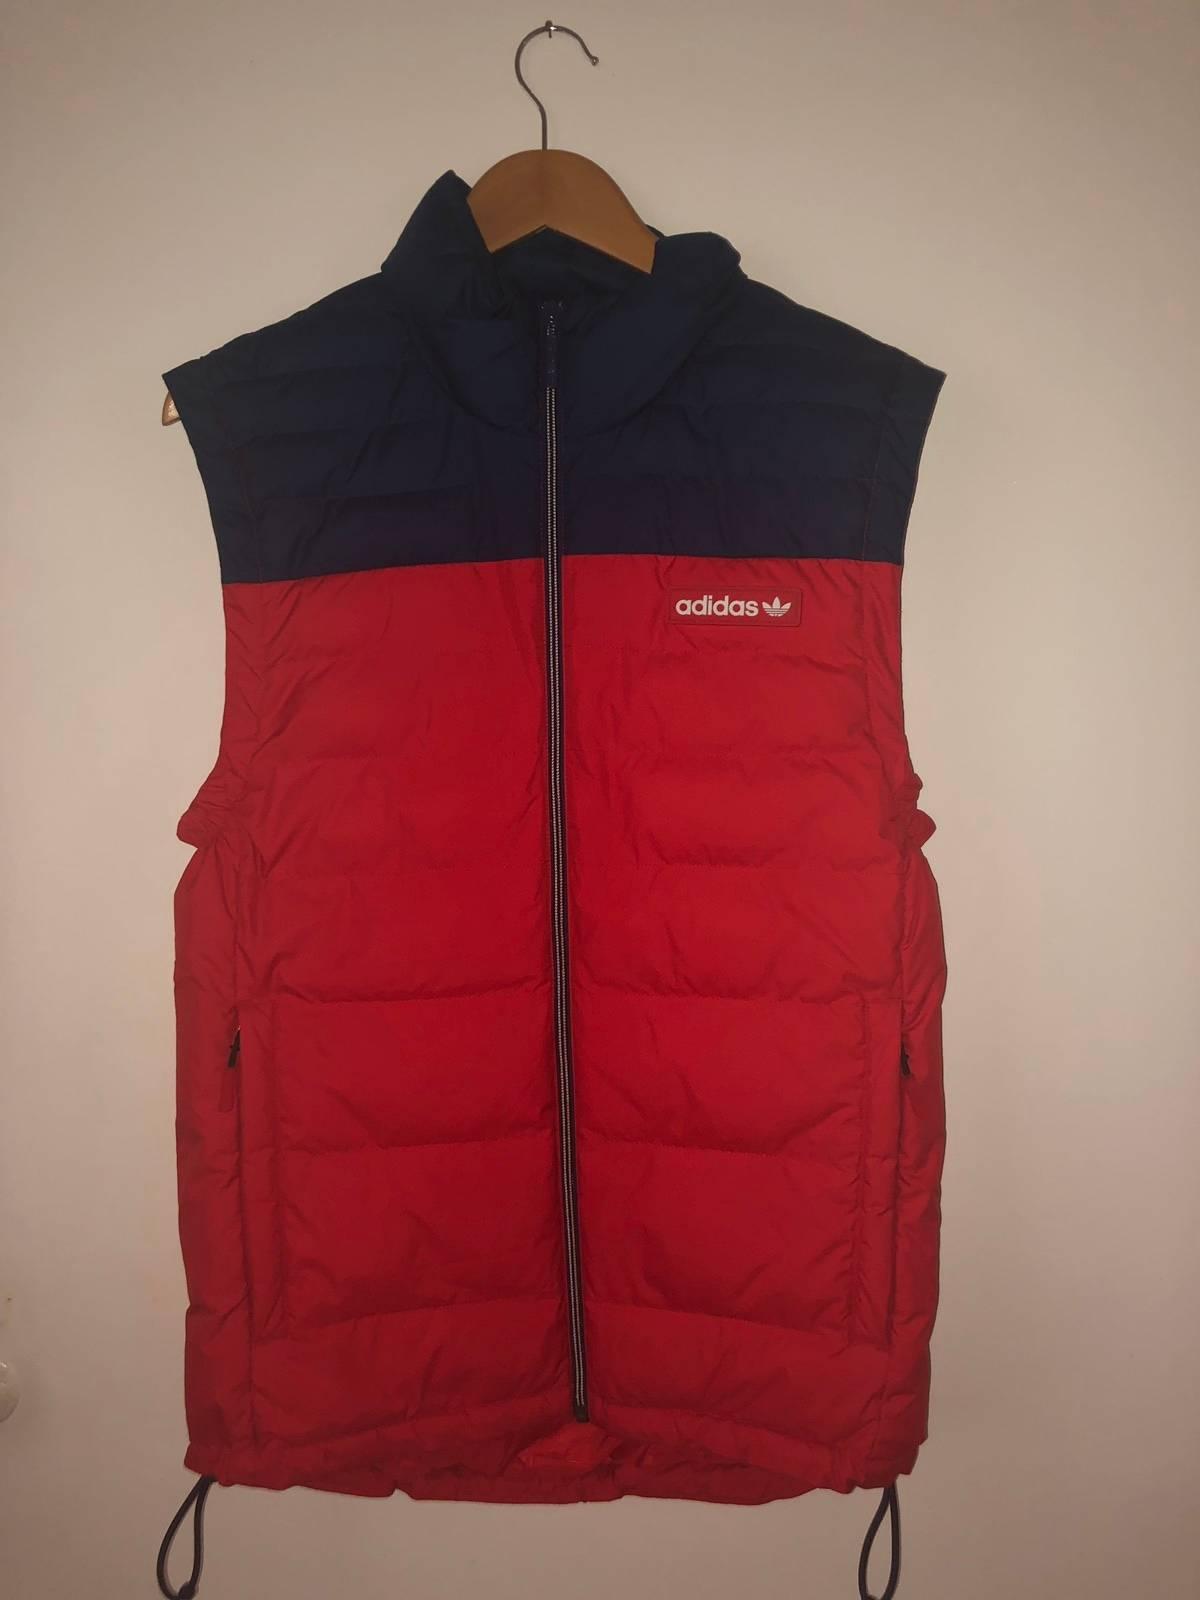 Adidas Adidas Original Down Vest Size S $65